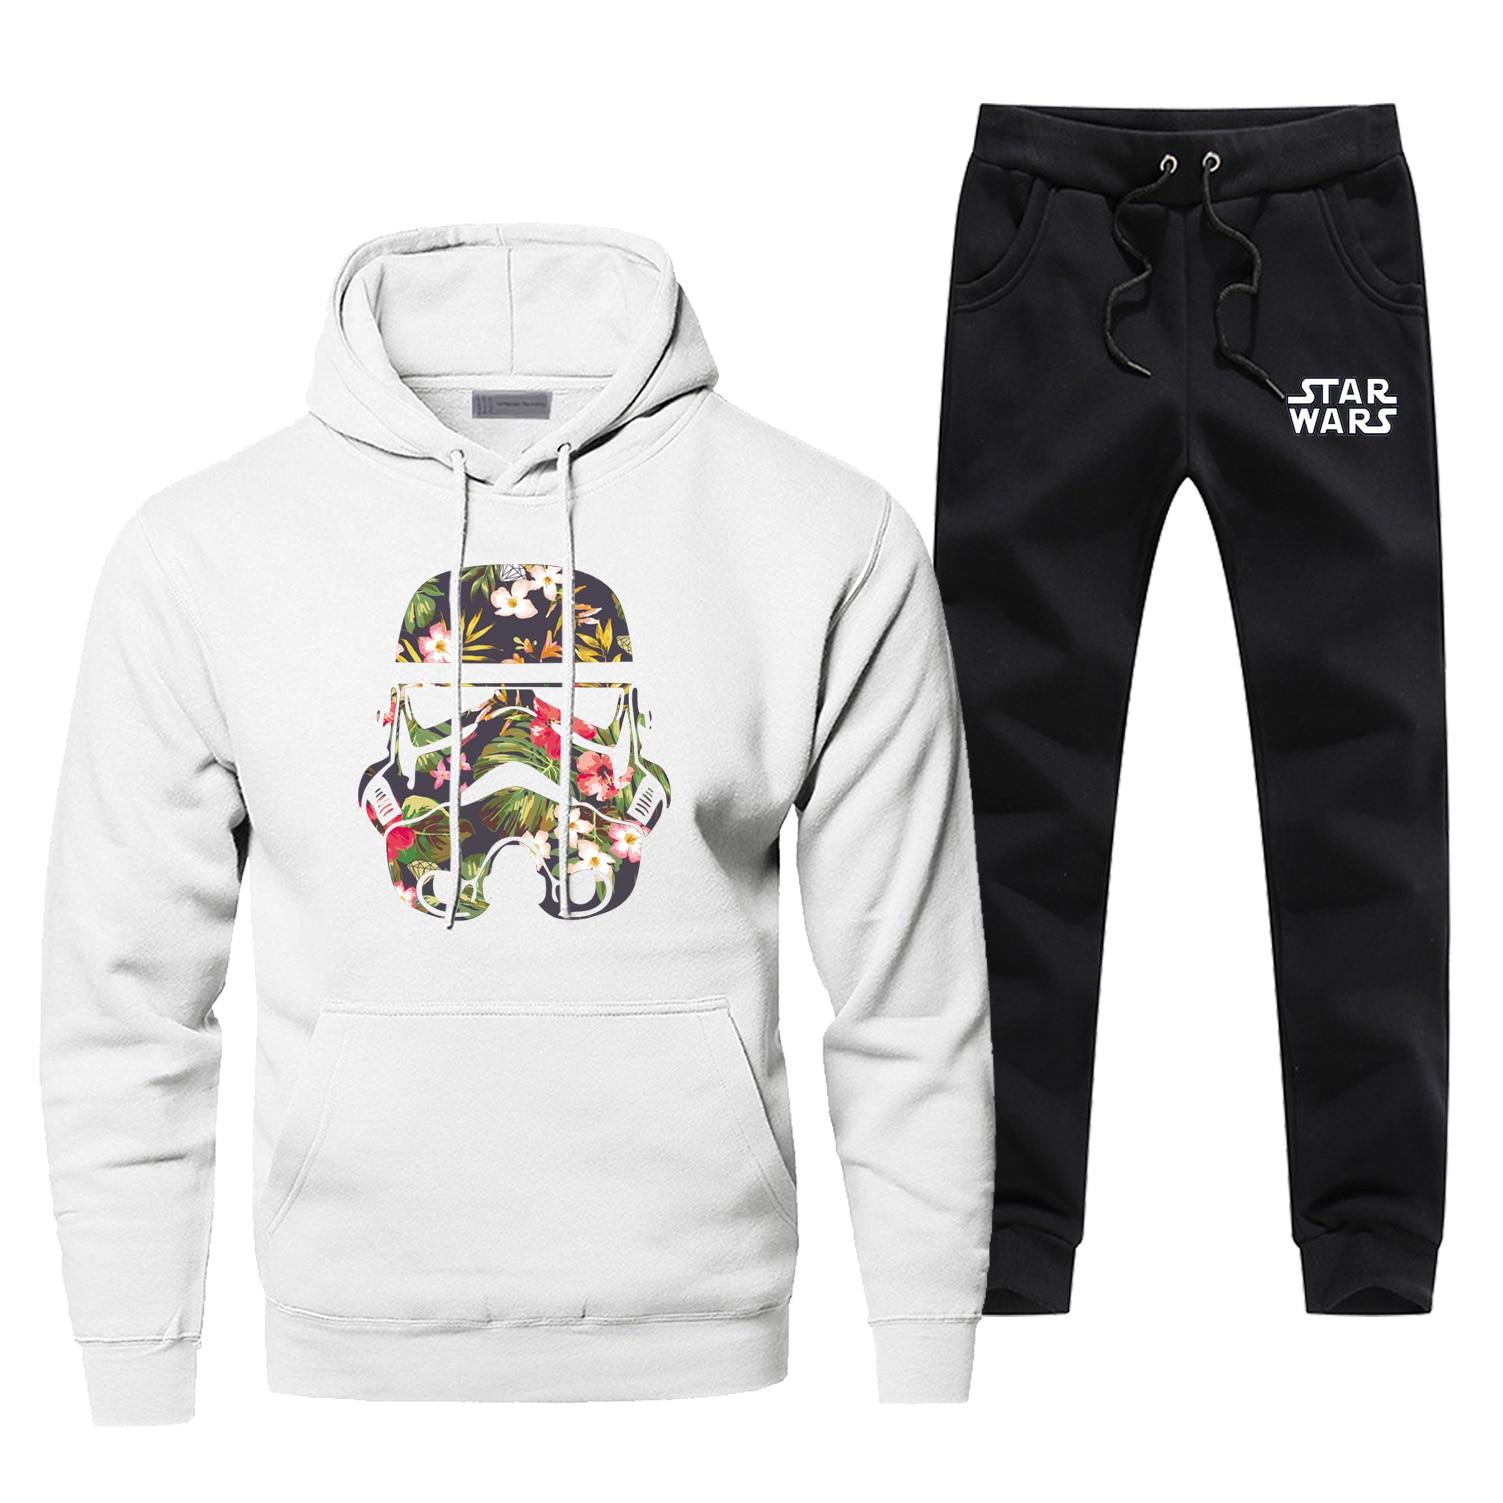 Star Wars Hoodies Pants Men Sets Selfie Stormtrooper Starwars Suit Pant Sweatshirt Sweatpants Sportswear Autumn 2 PCS Tracksuit